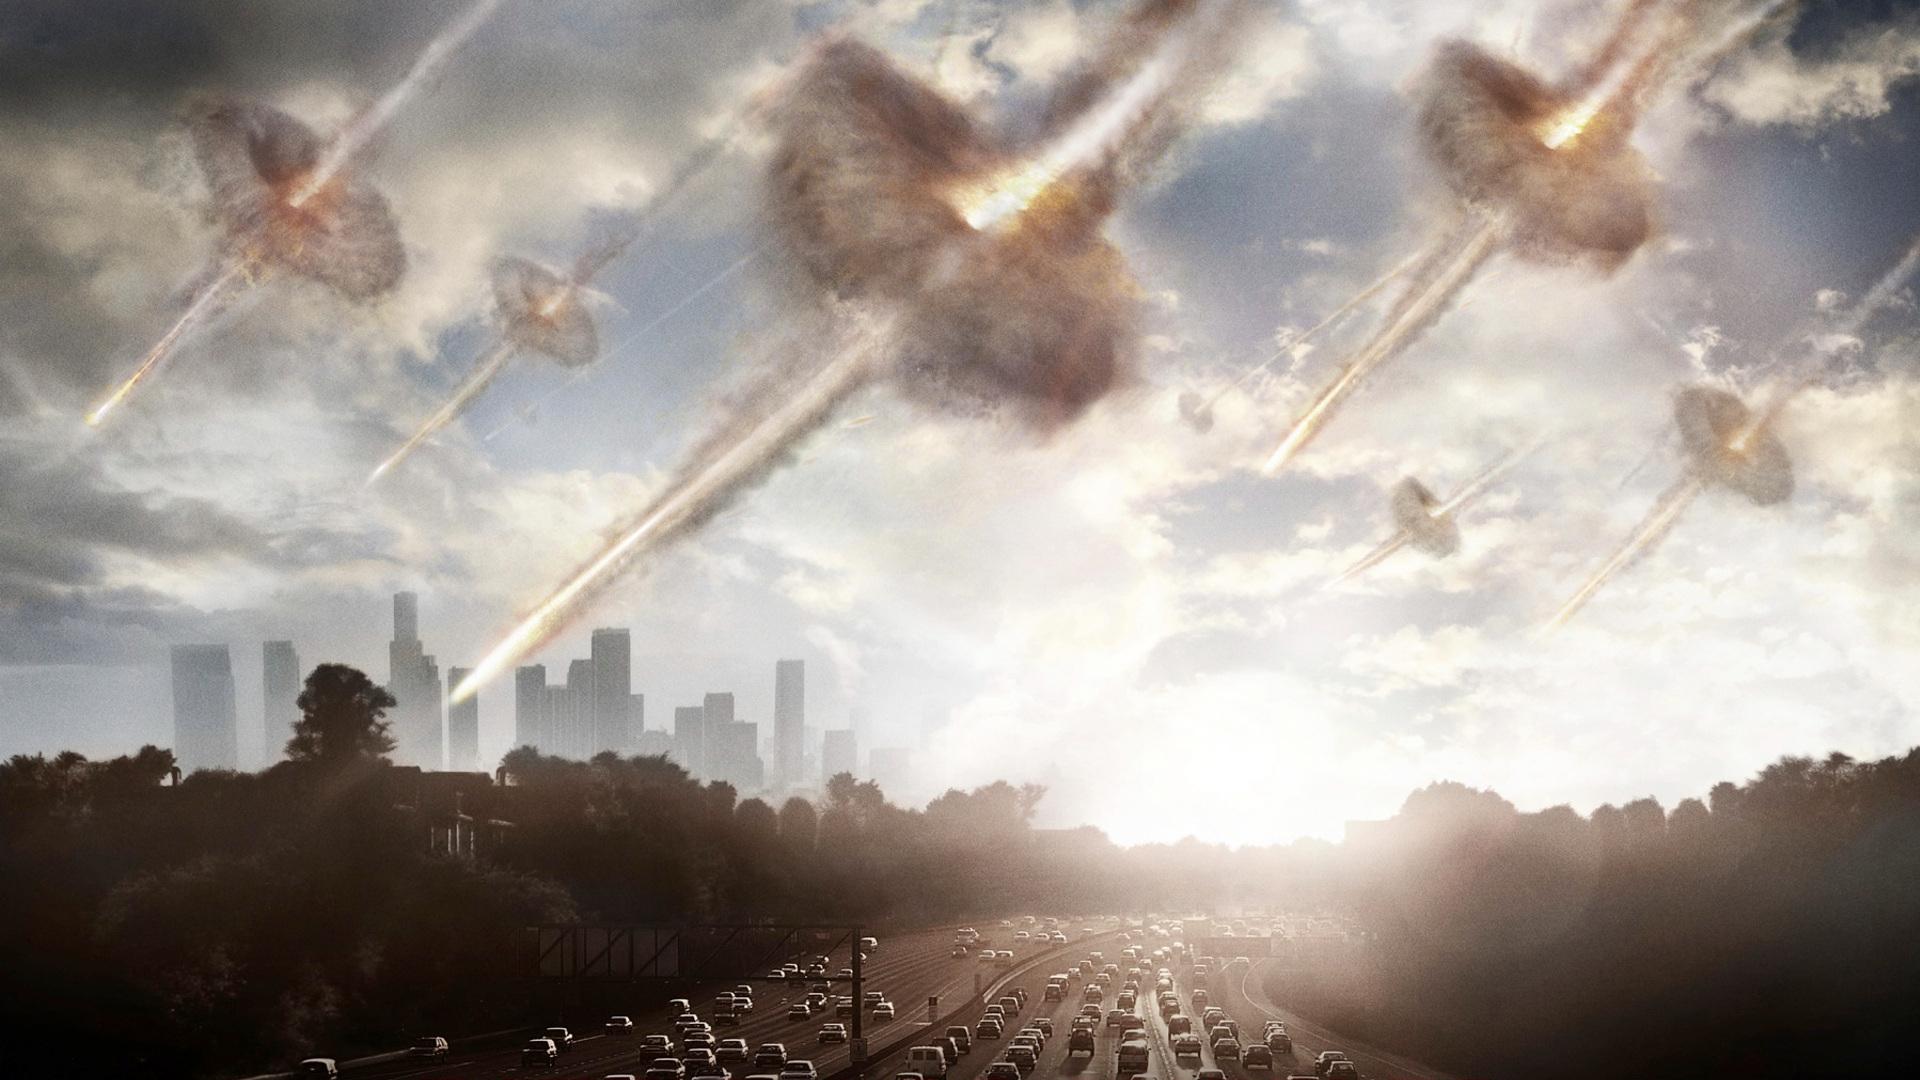 Battle Los Angeles 2